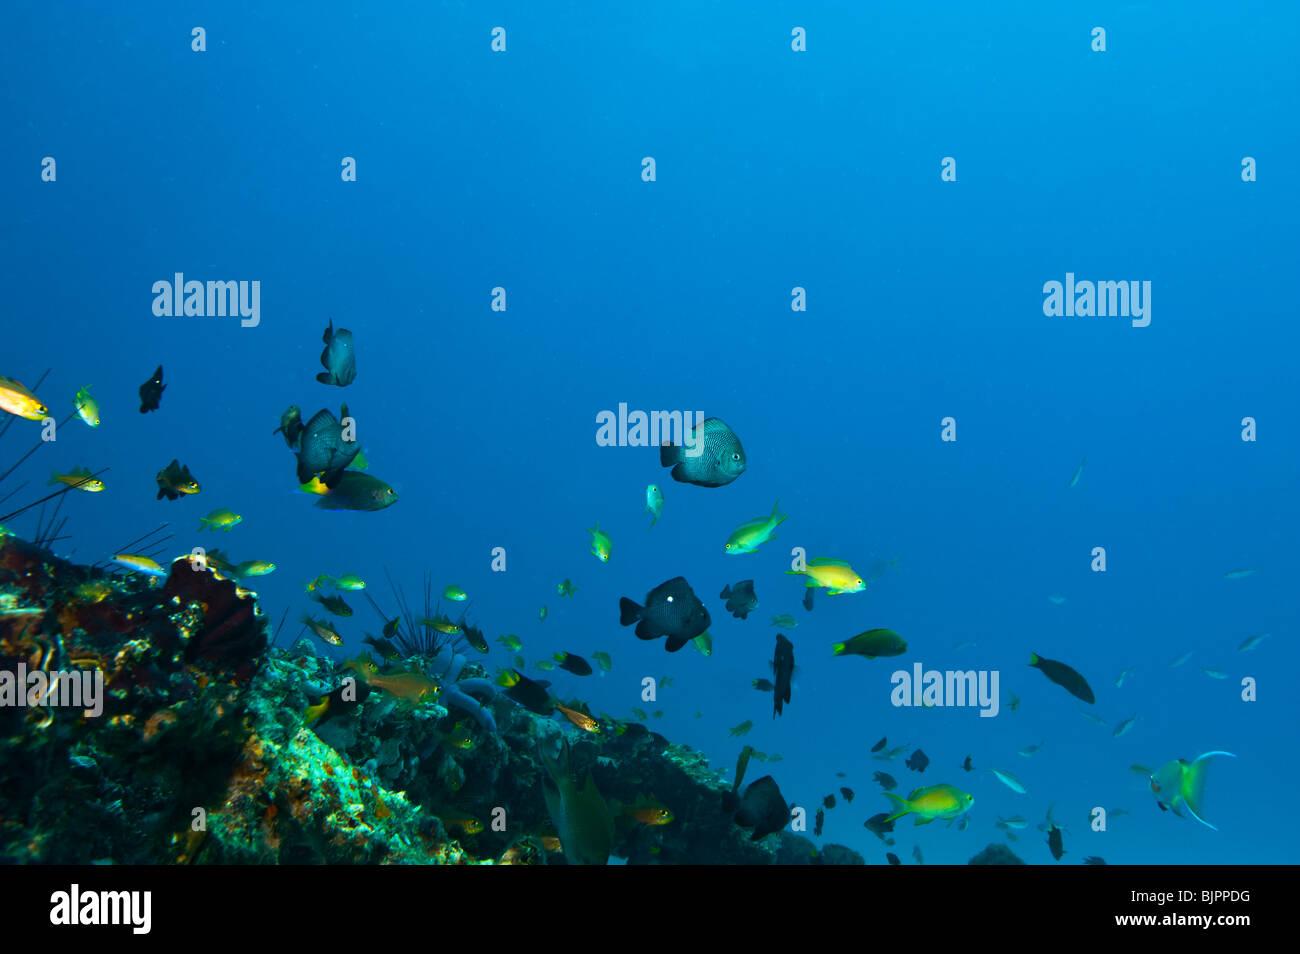 reef Malapascua manifold versatile multiplex life on reef fish starfish sea urchin under water  Cebu Philippines - Stock Image